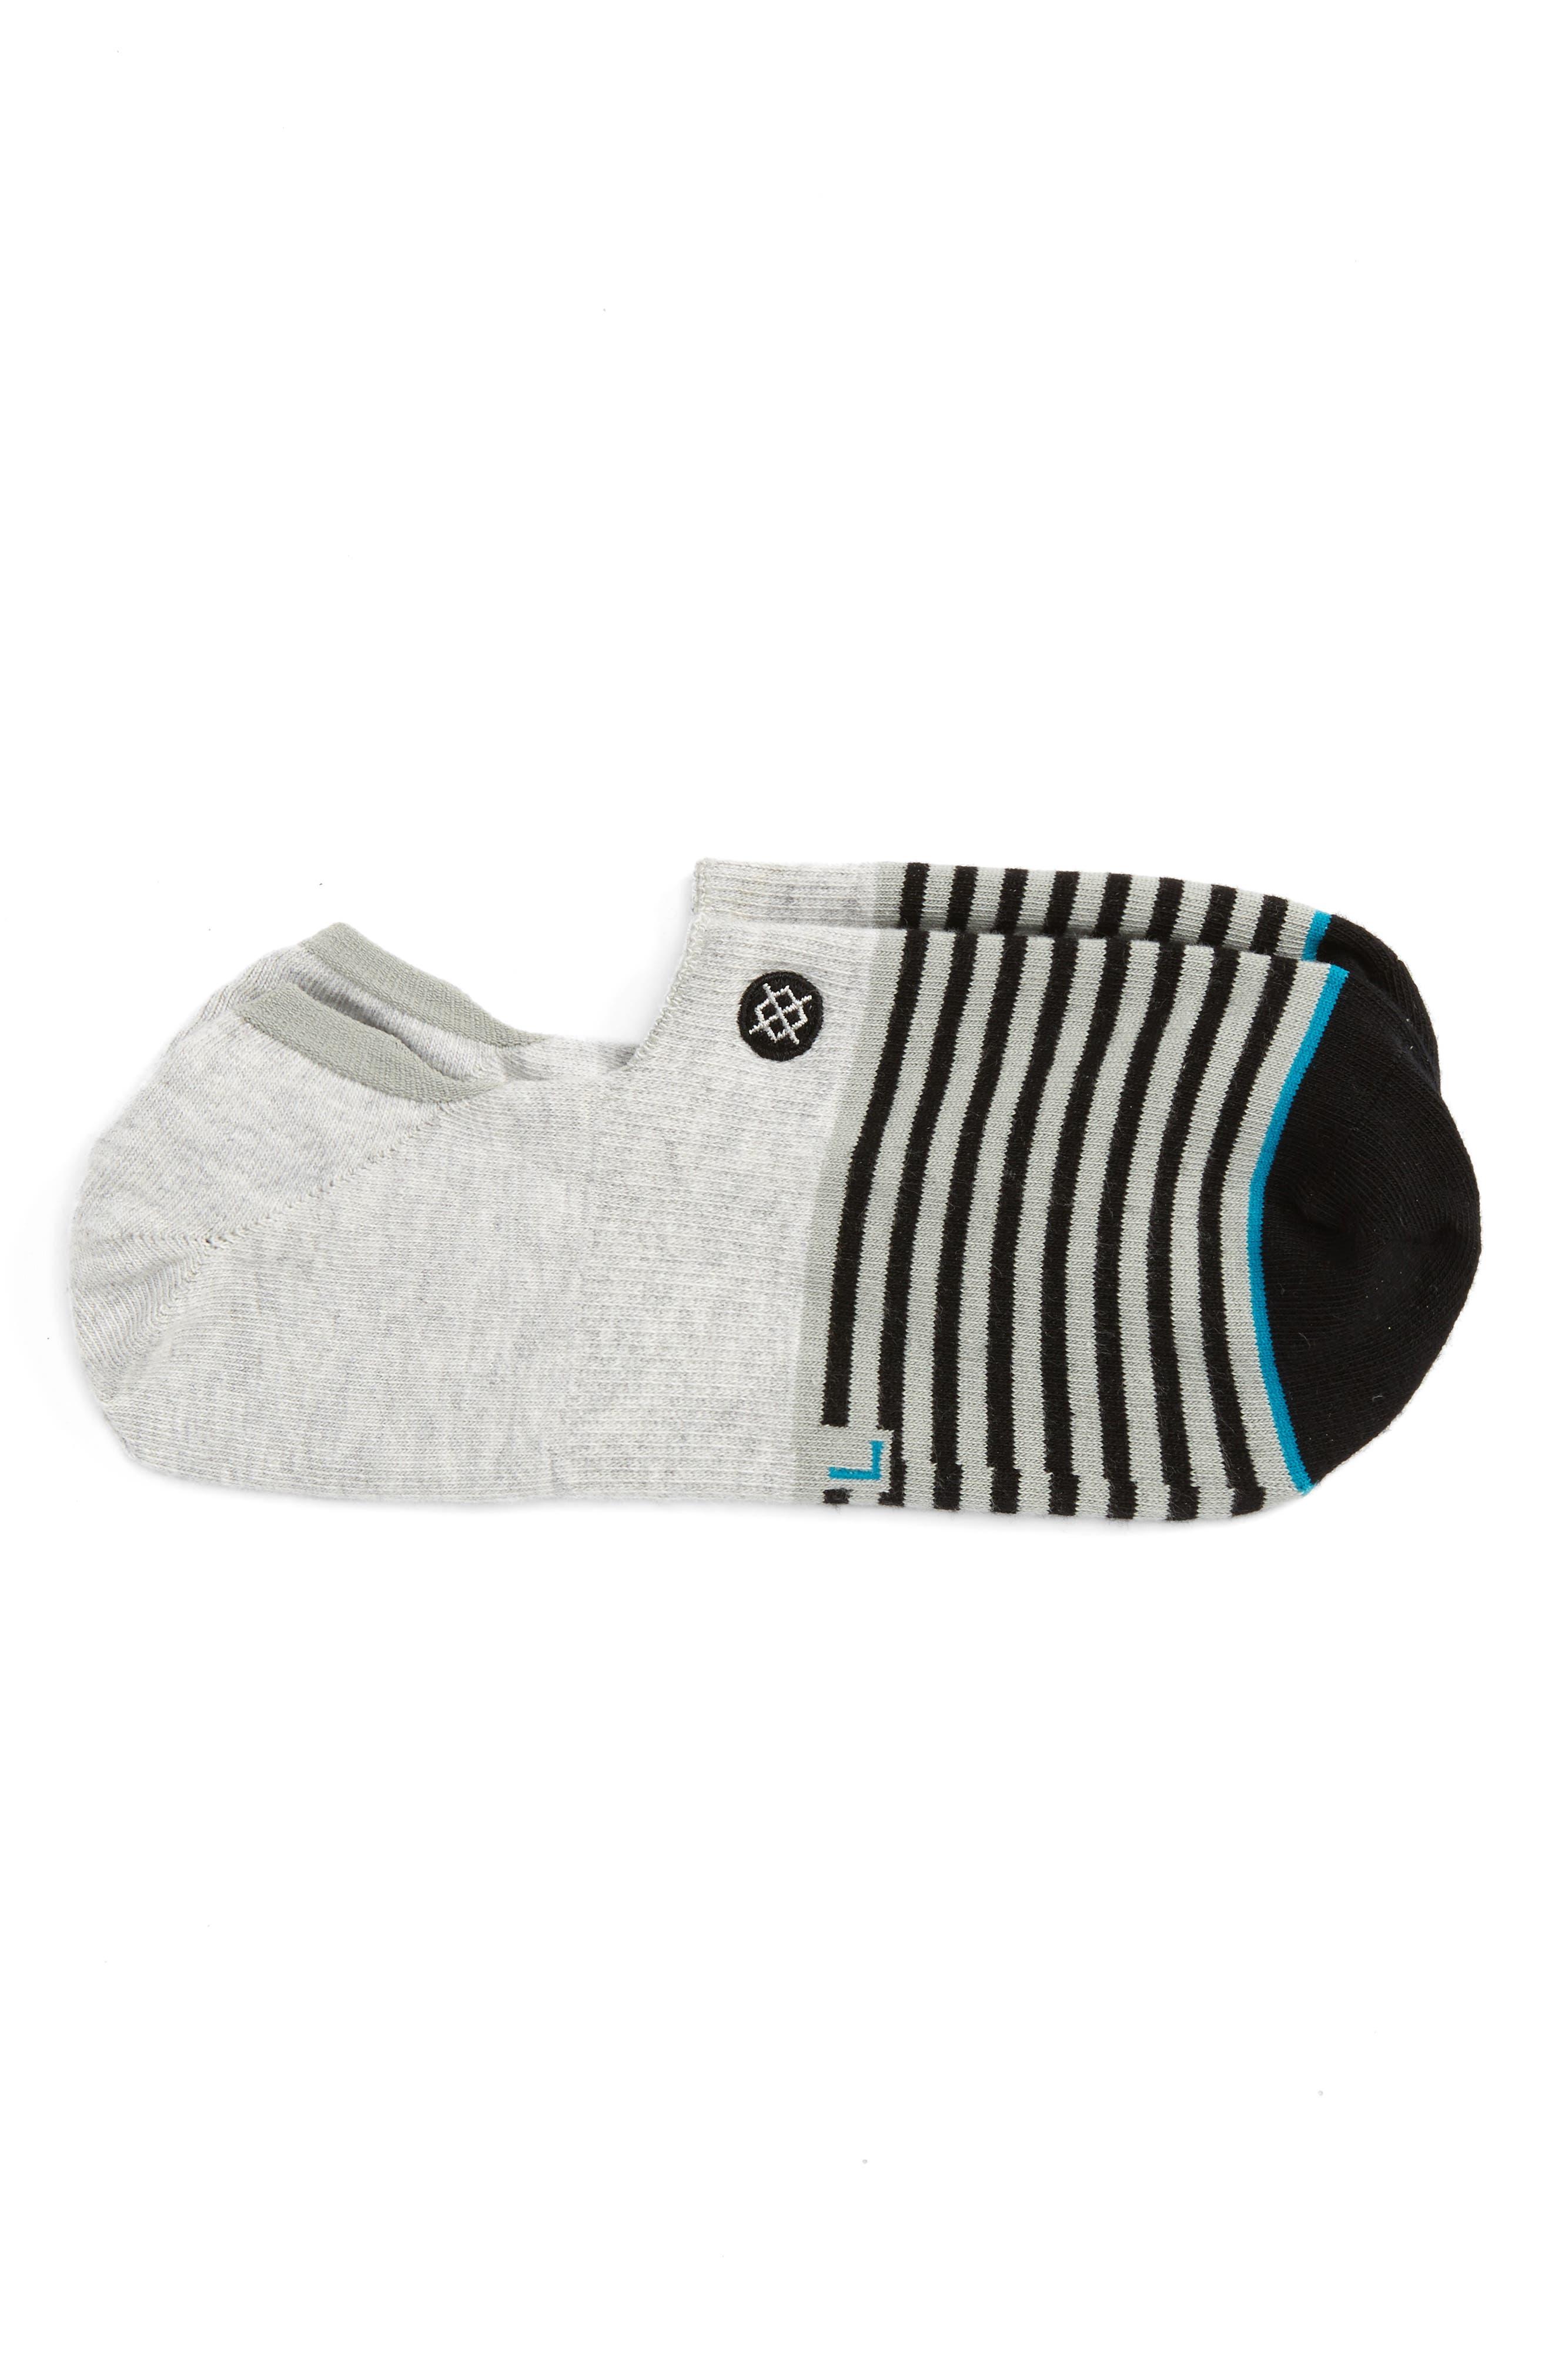 Stance Nagano Striped No-Show Socks